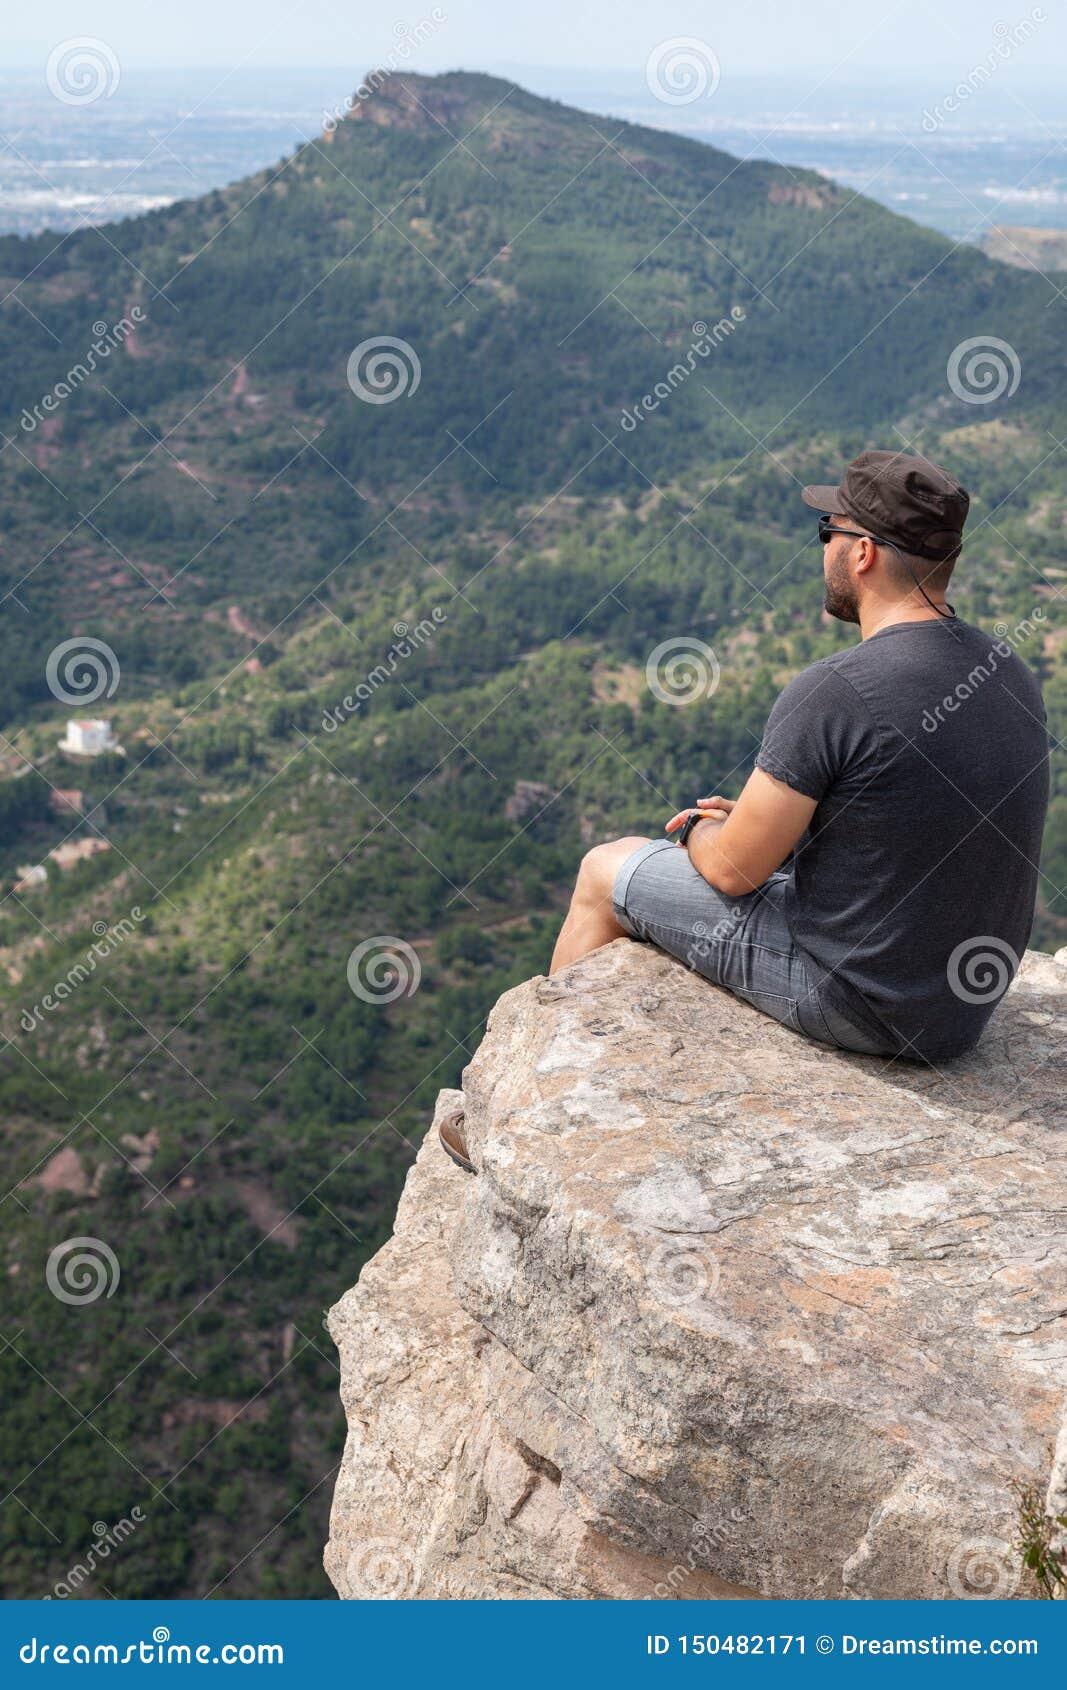 Panoramablick des Touristen auf Bergspitze